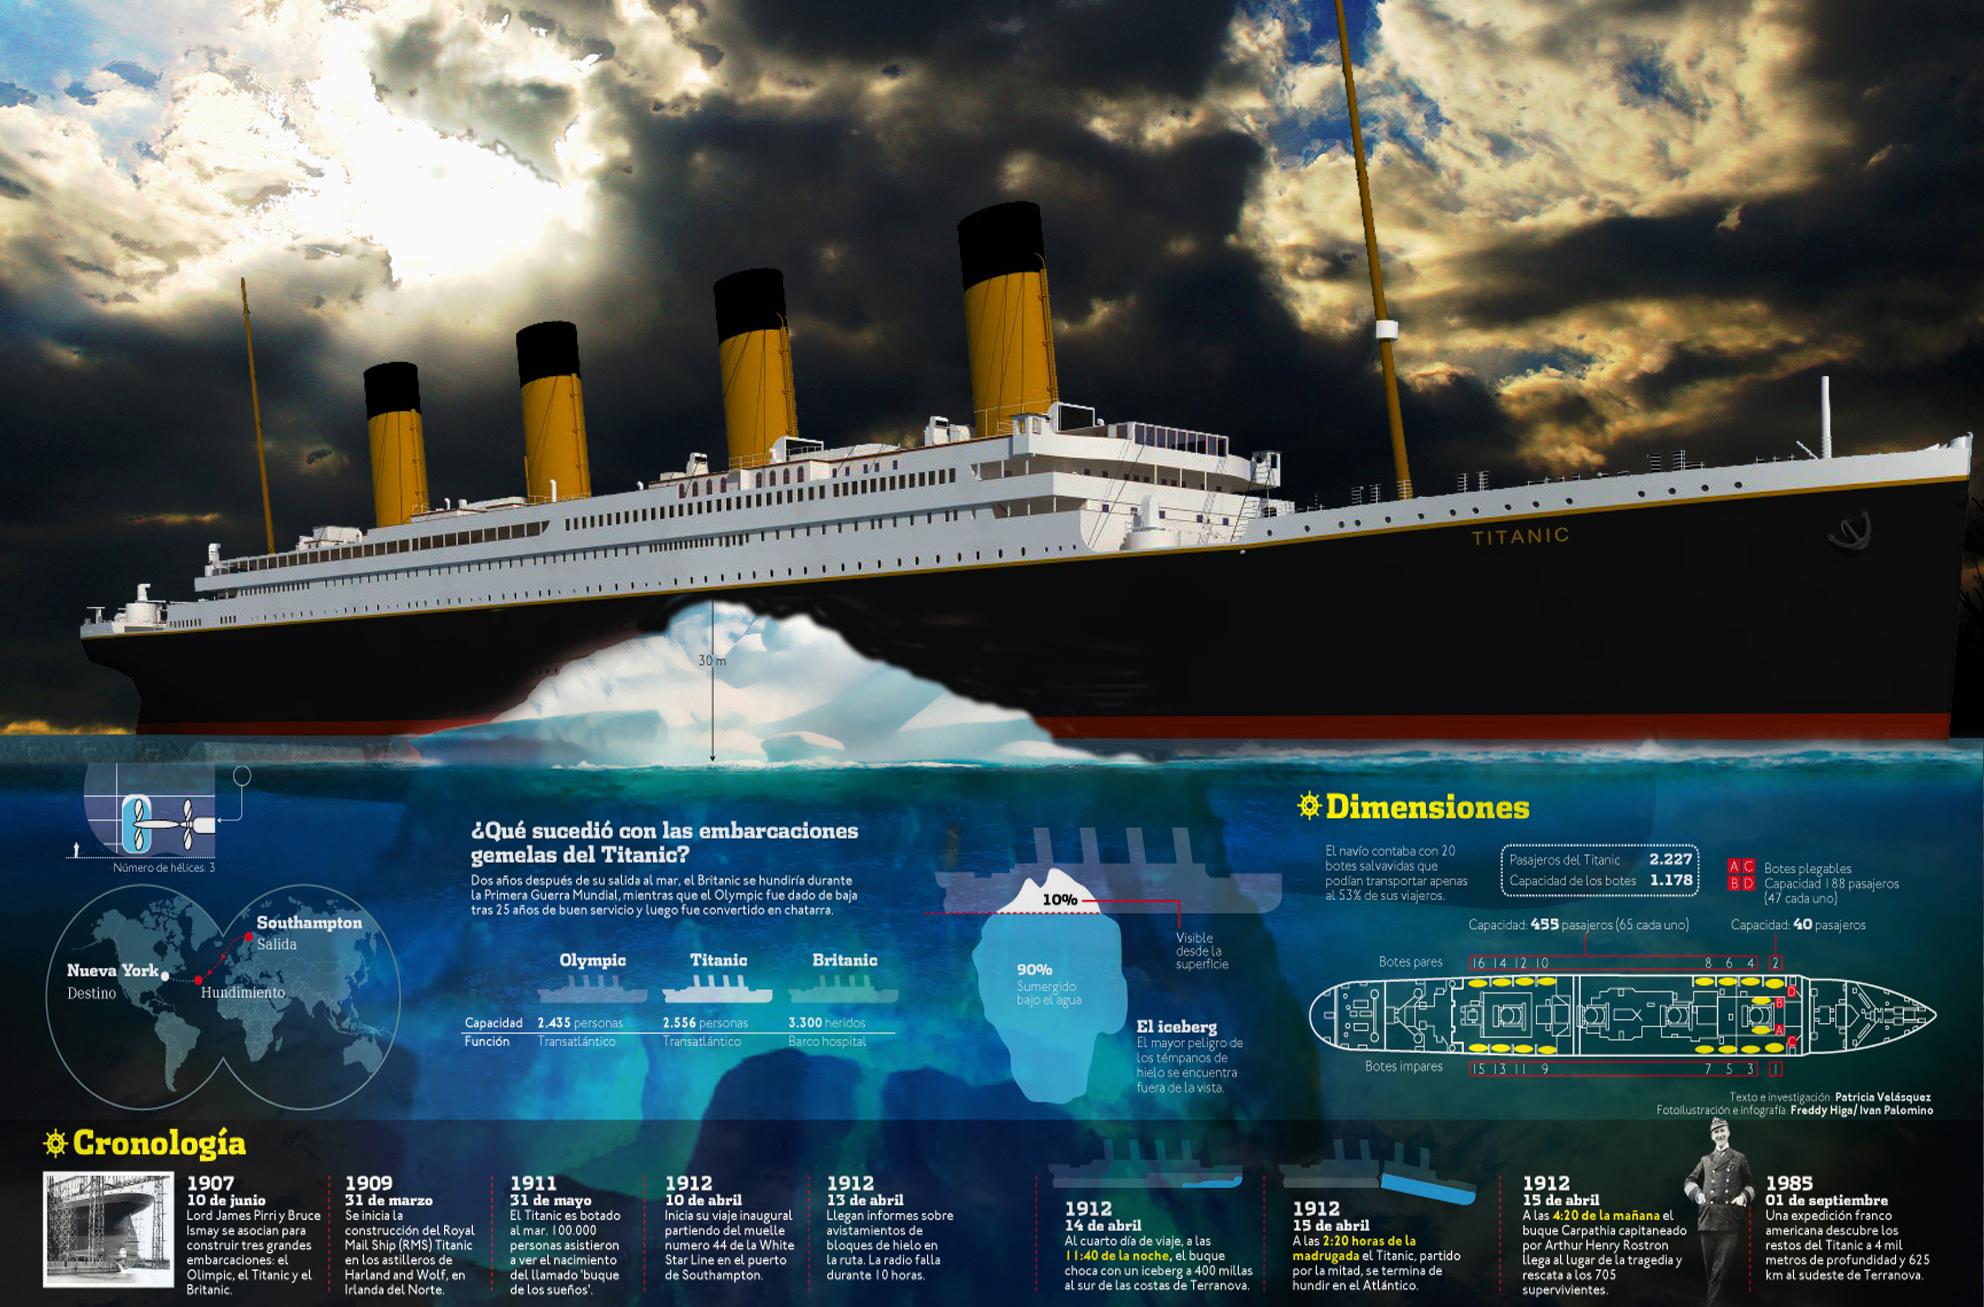 Titanic, el naufragio del siglo | Mundo | Vanguardia.com